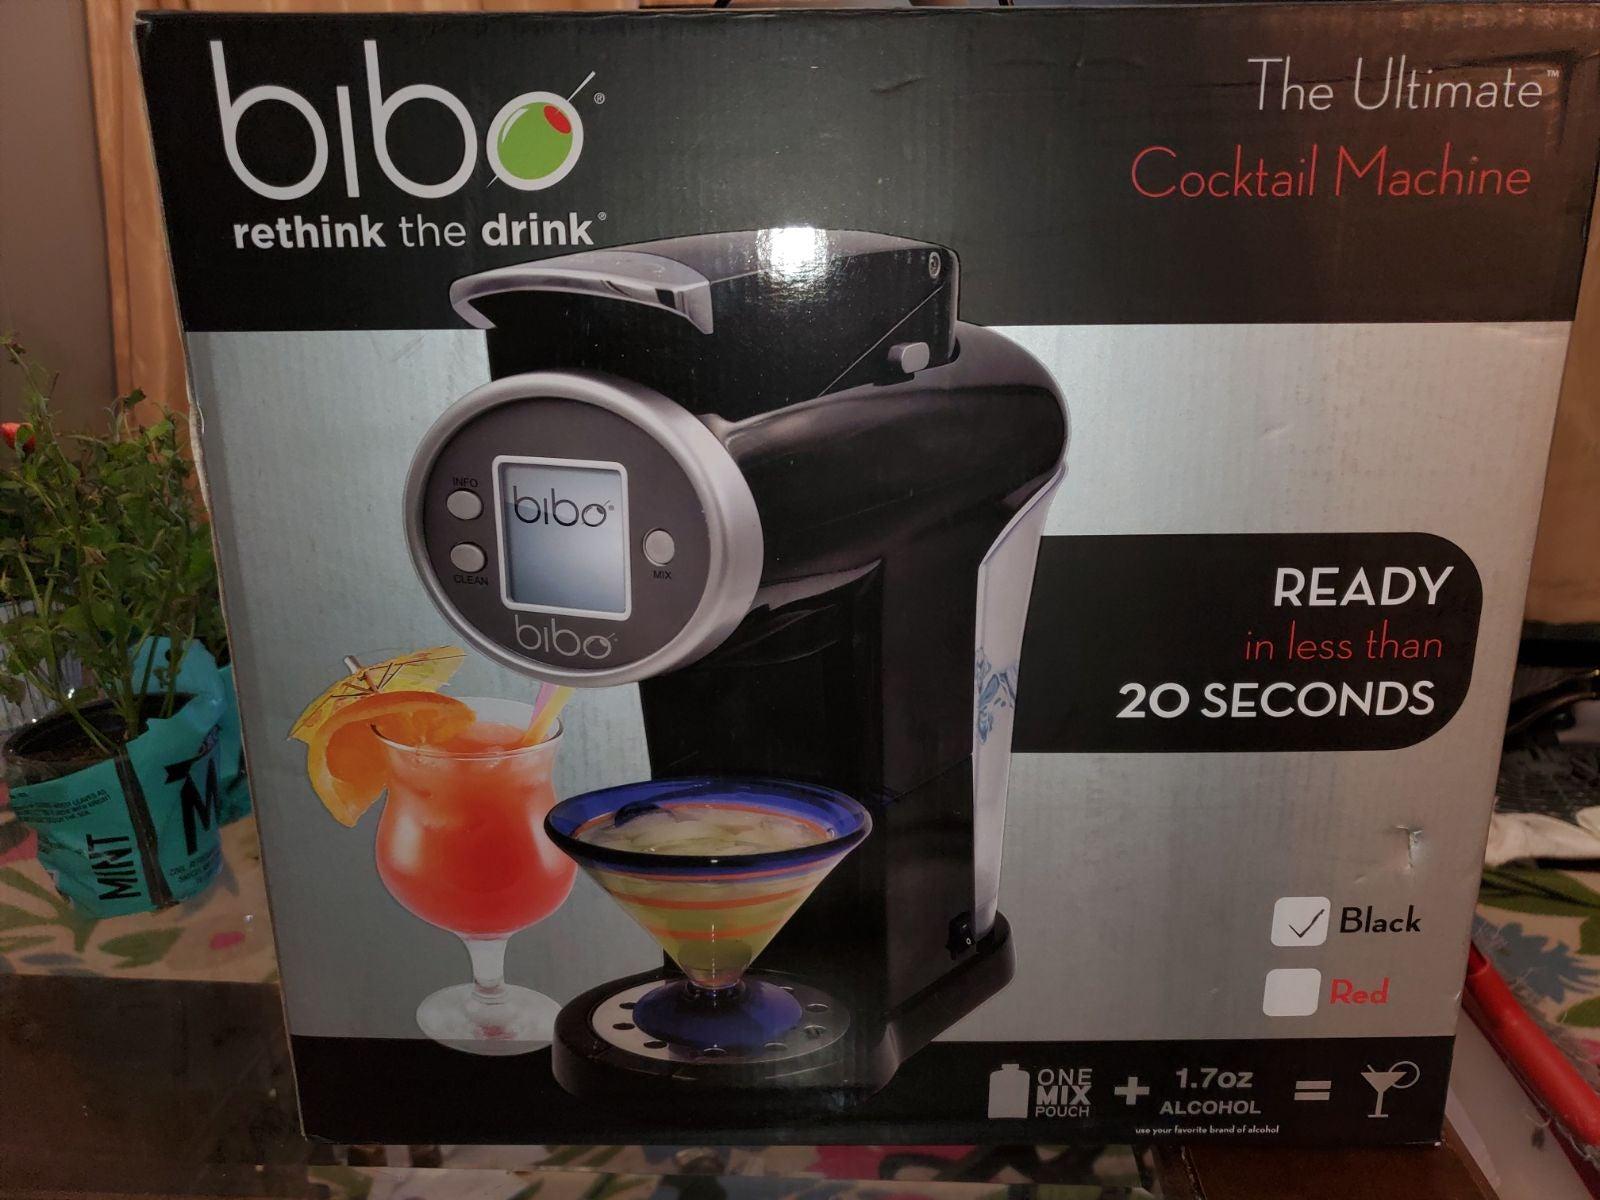 Bibo Cocktail machine